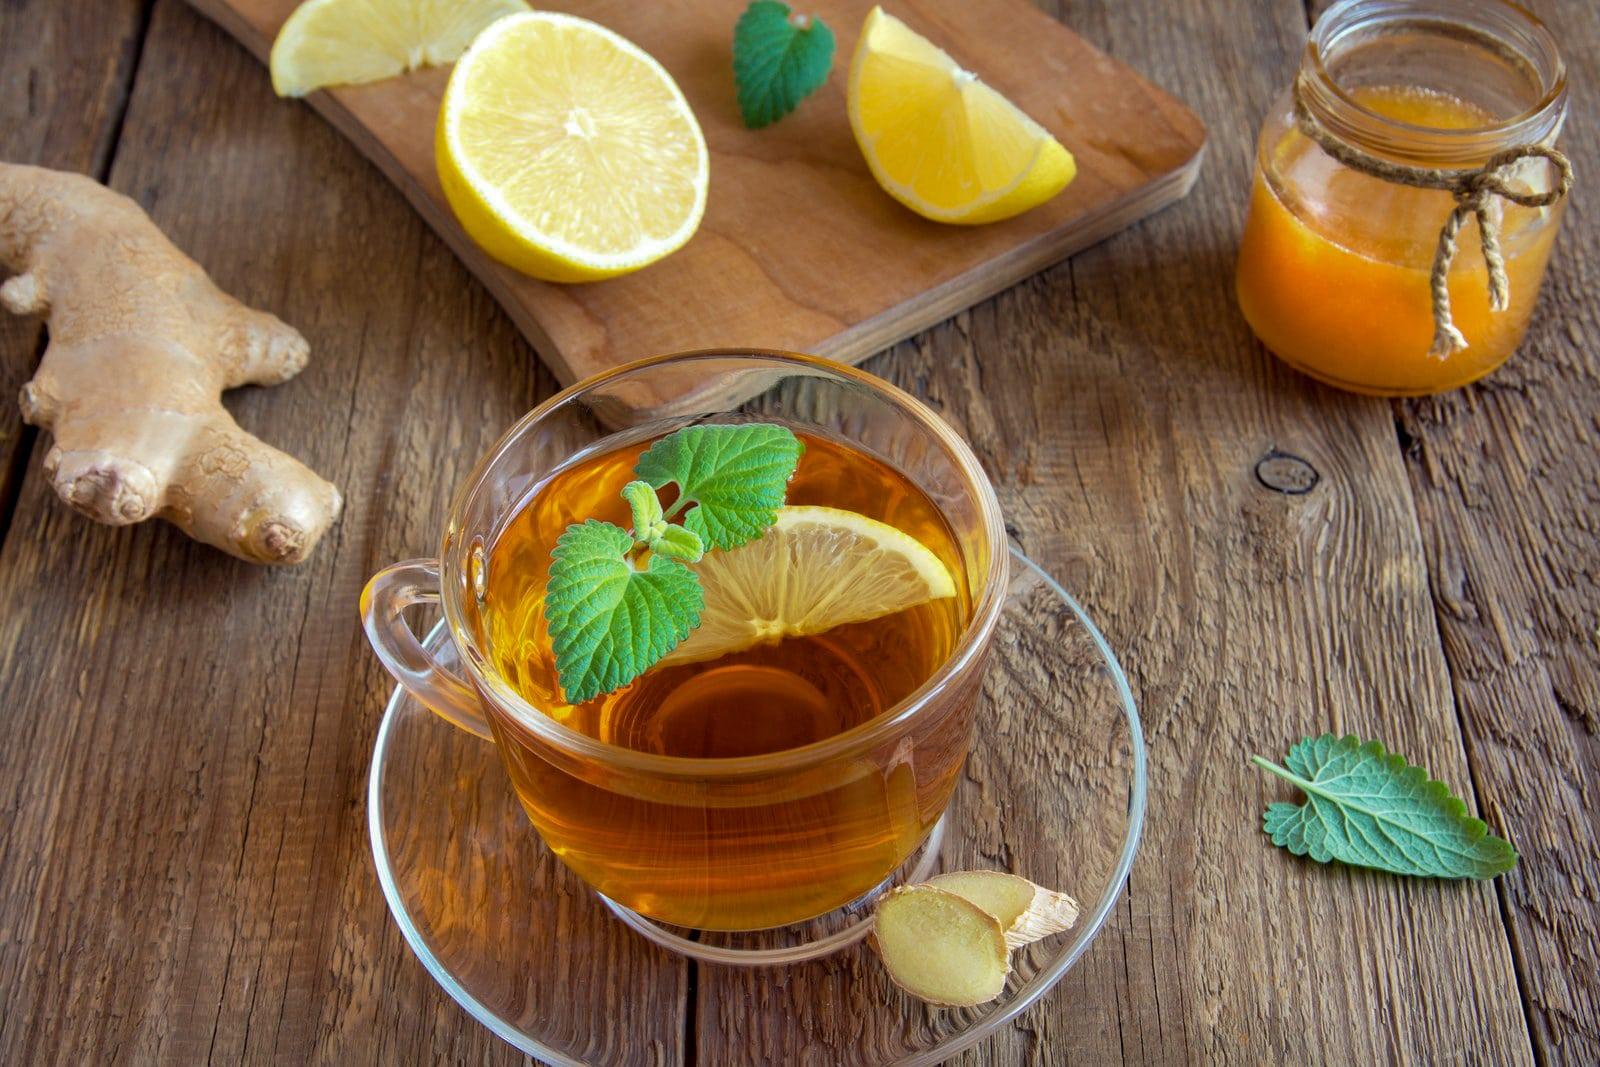 How to serve black tea with lemon & honey